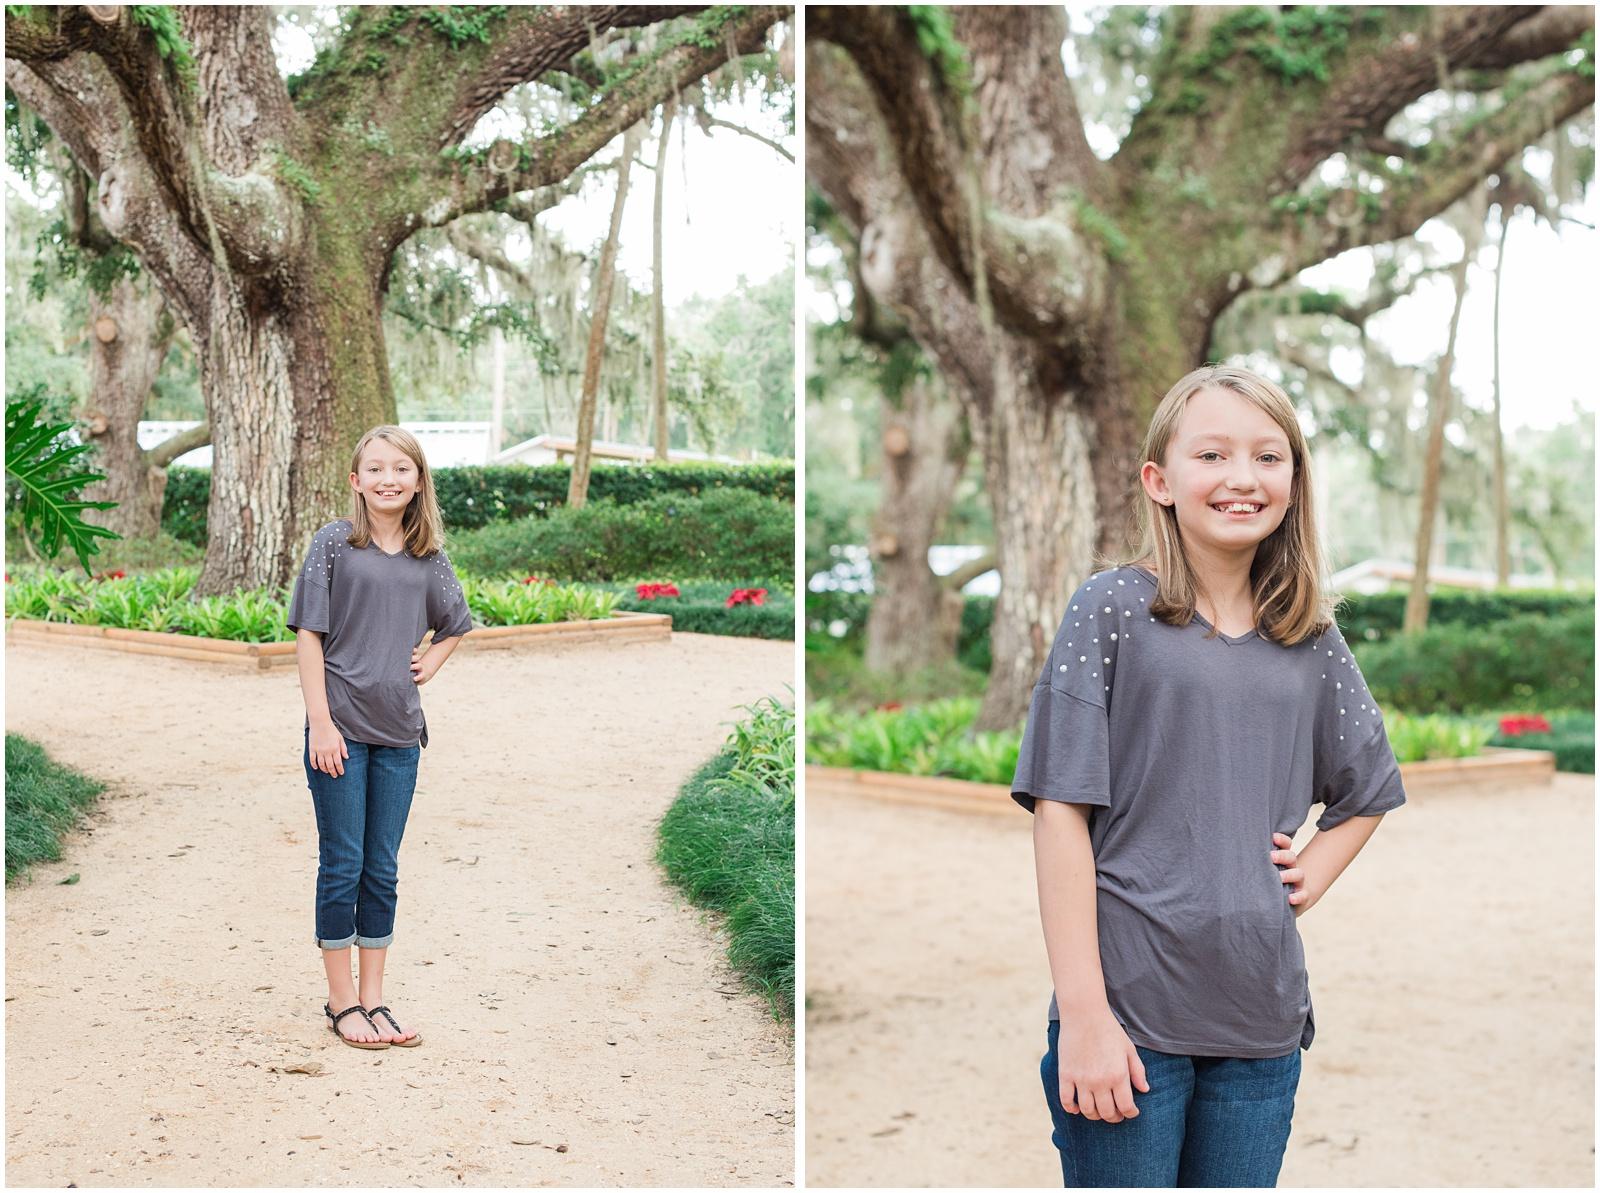 Washington Oaks_Garden_State Park_Beach_Family_Portraits_5.jpg